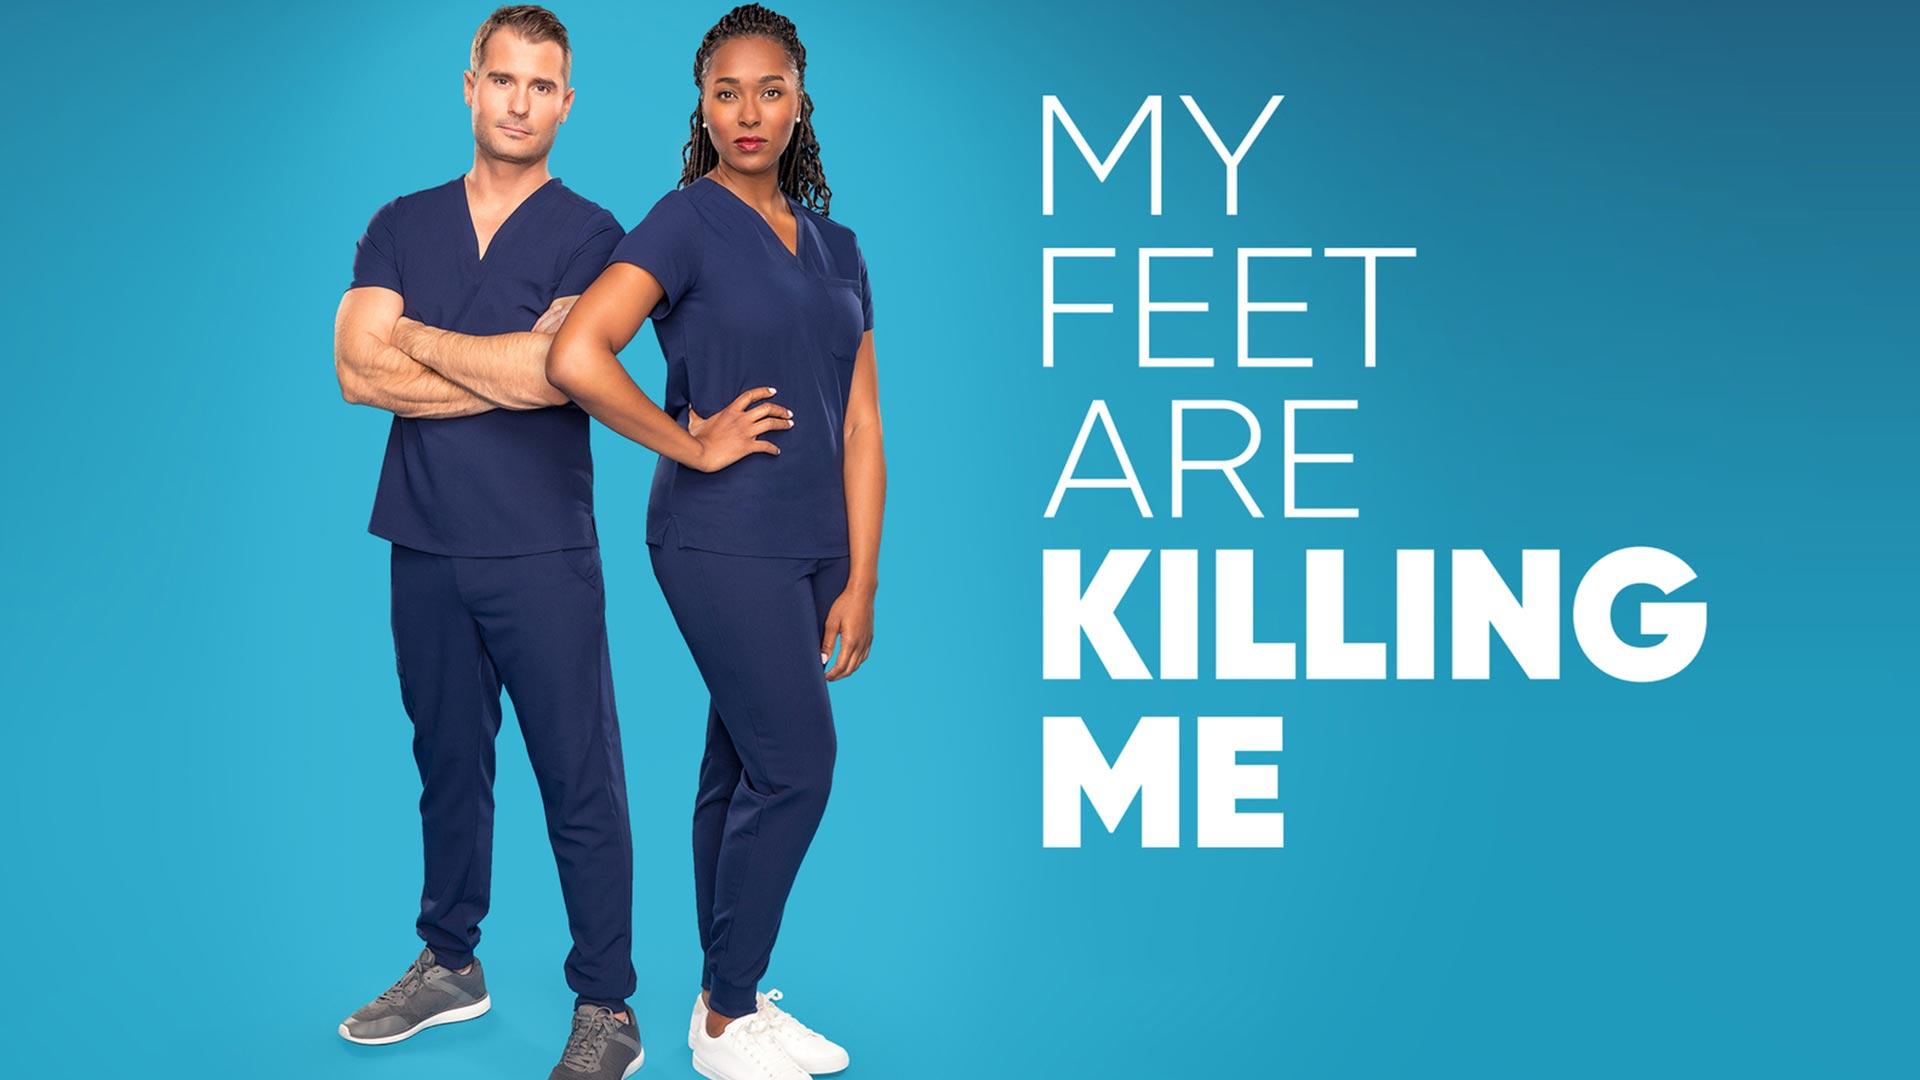 My Feet Are Killing Me - Season 1